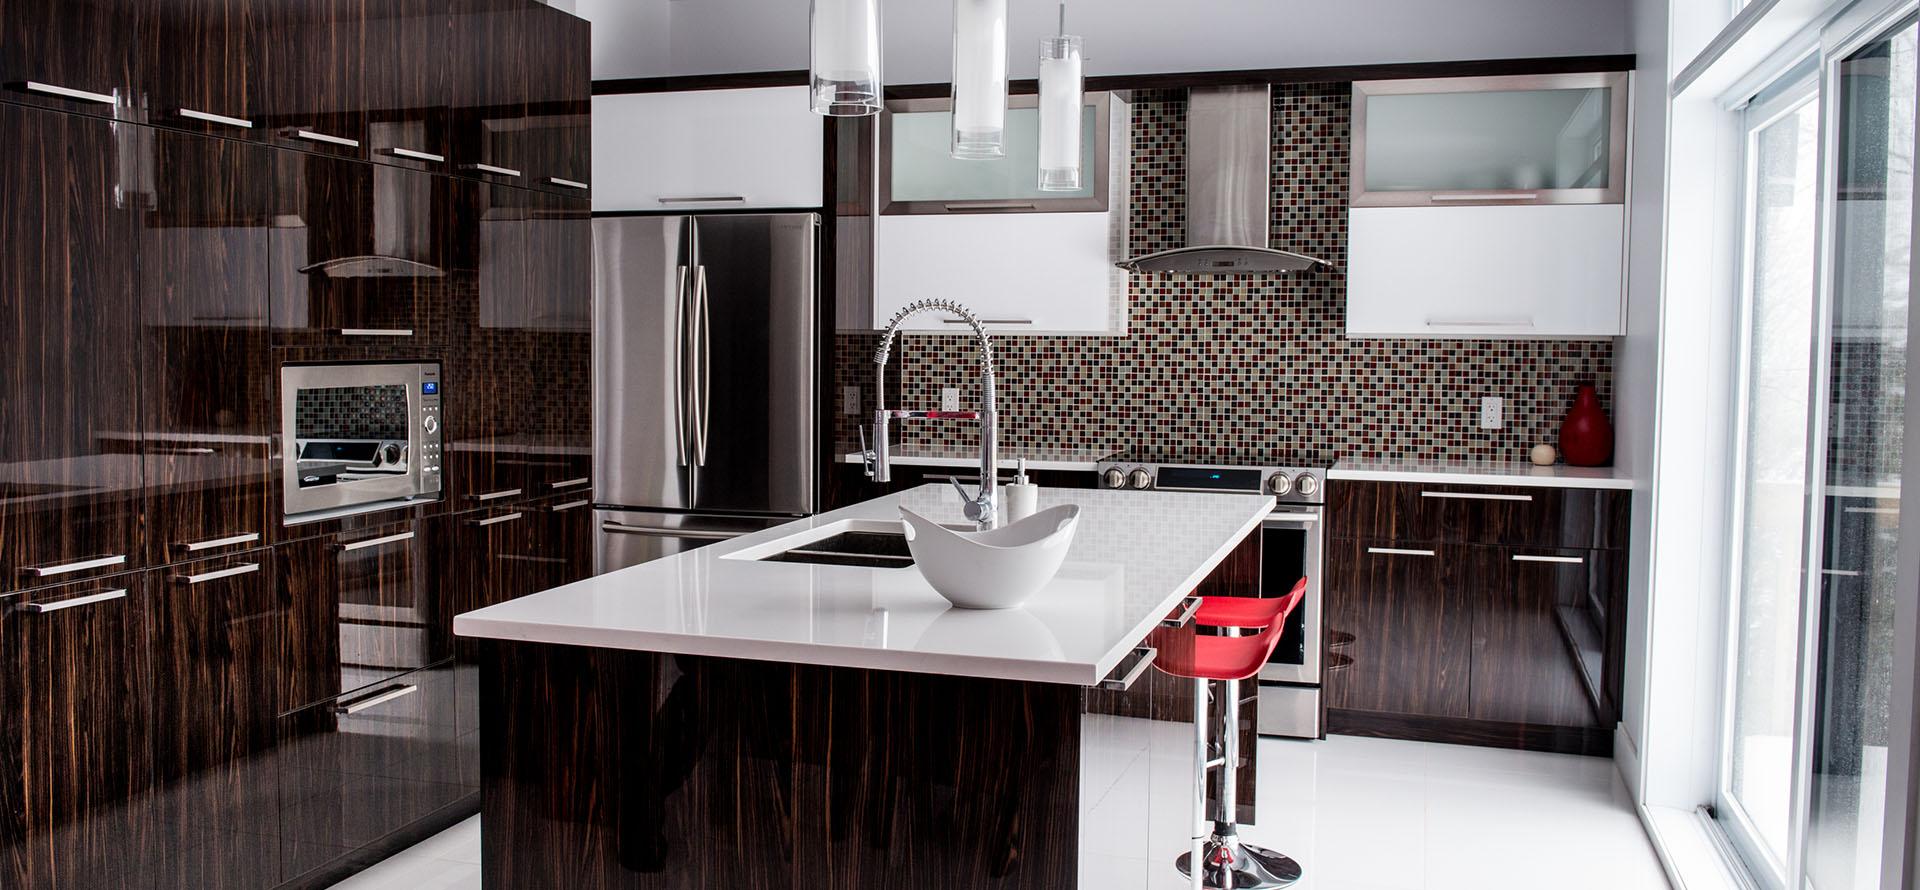 Home Cuisine Moderne